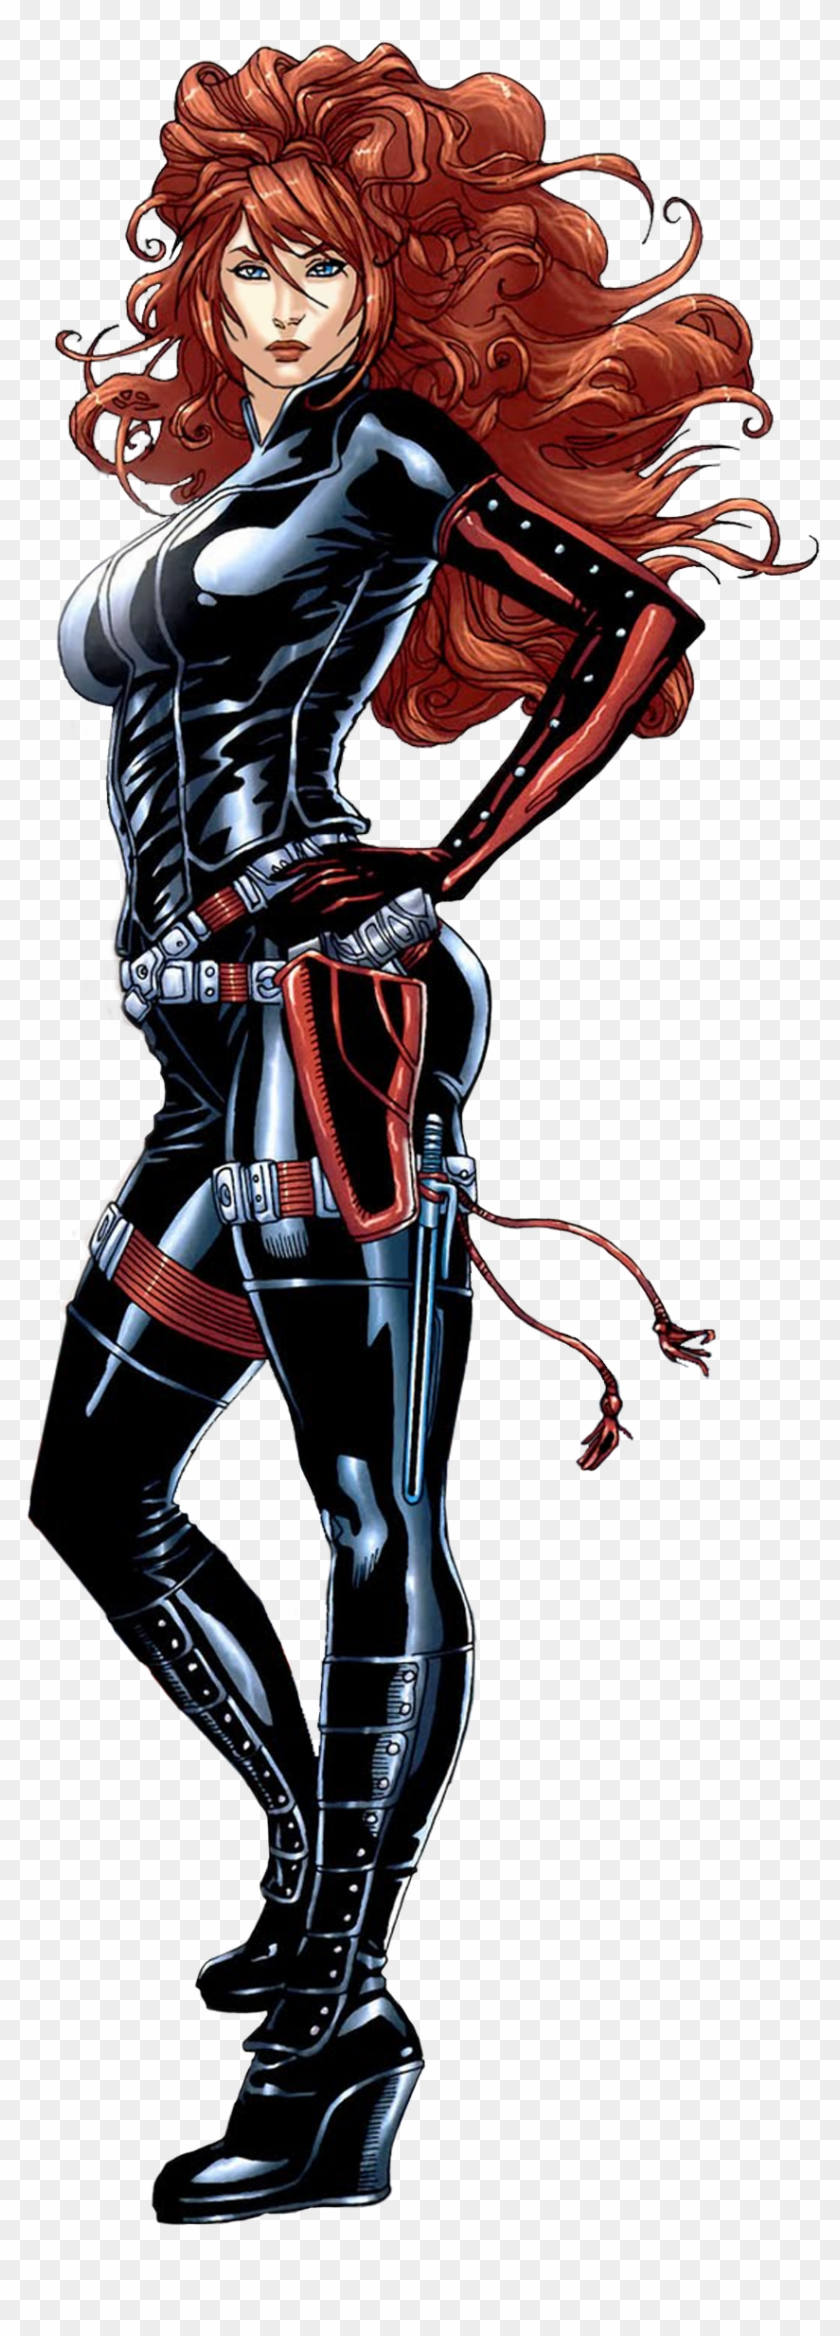 Black Widow From The Avengers - Comic Book Black Widow Transparent Clipart #4031448